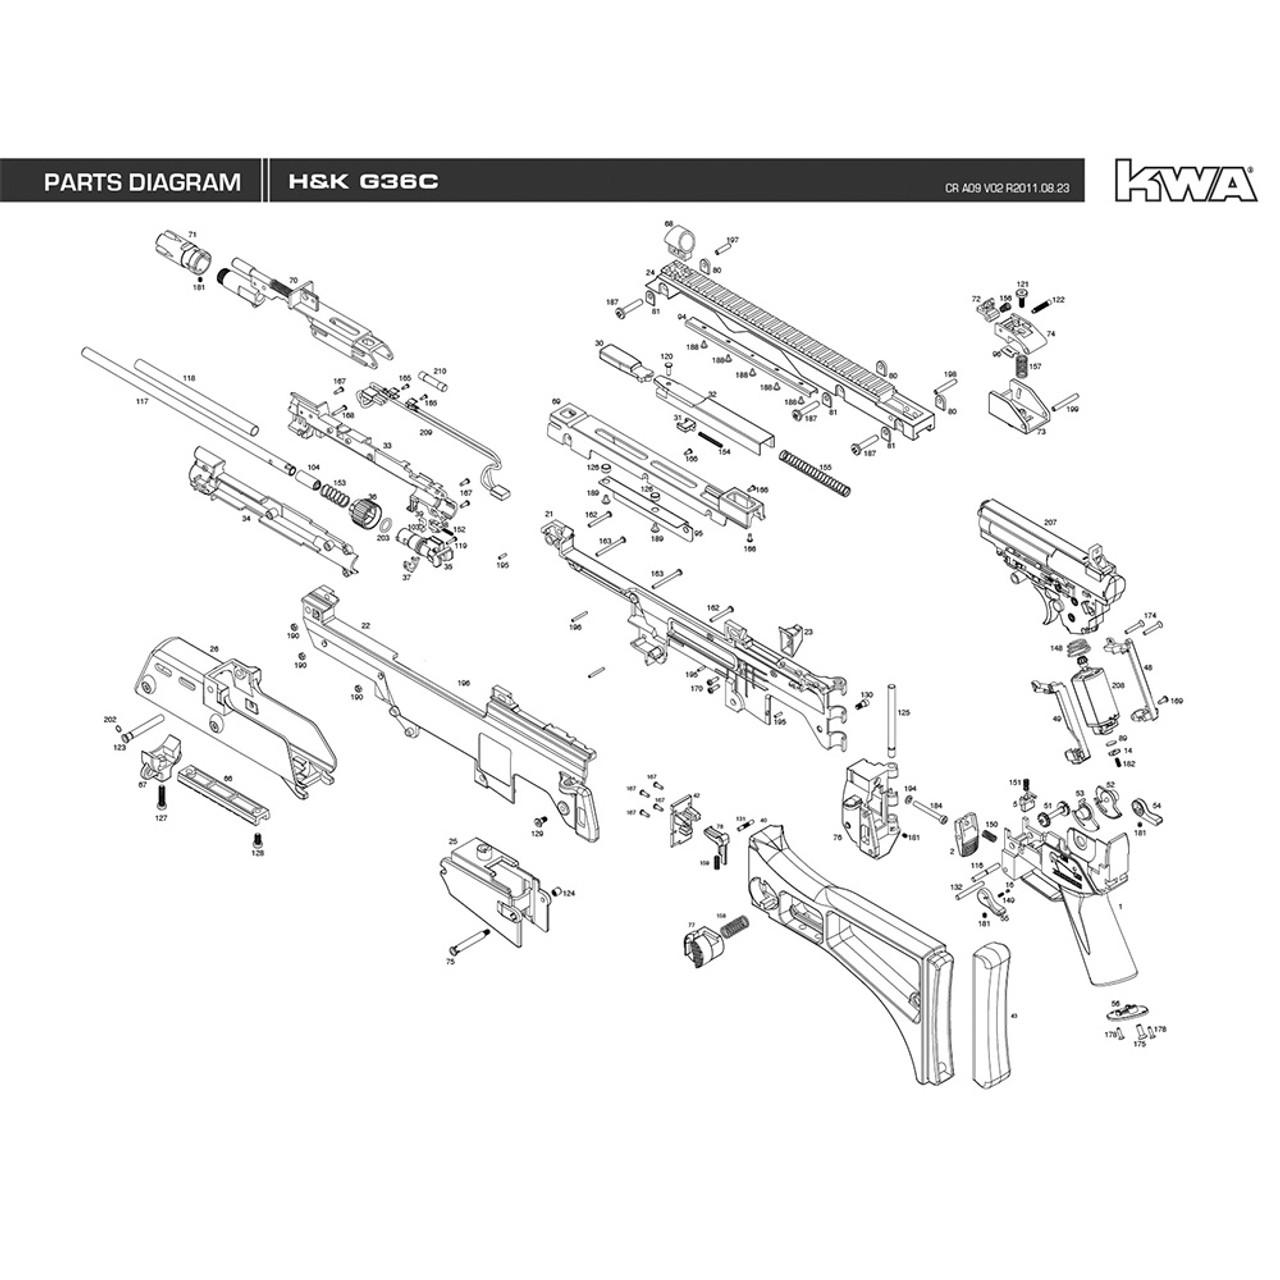 KWA AIRSOFT H&K G36C RIFLE DIAGRAM - MiR Tactical